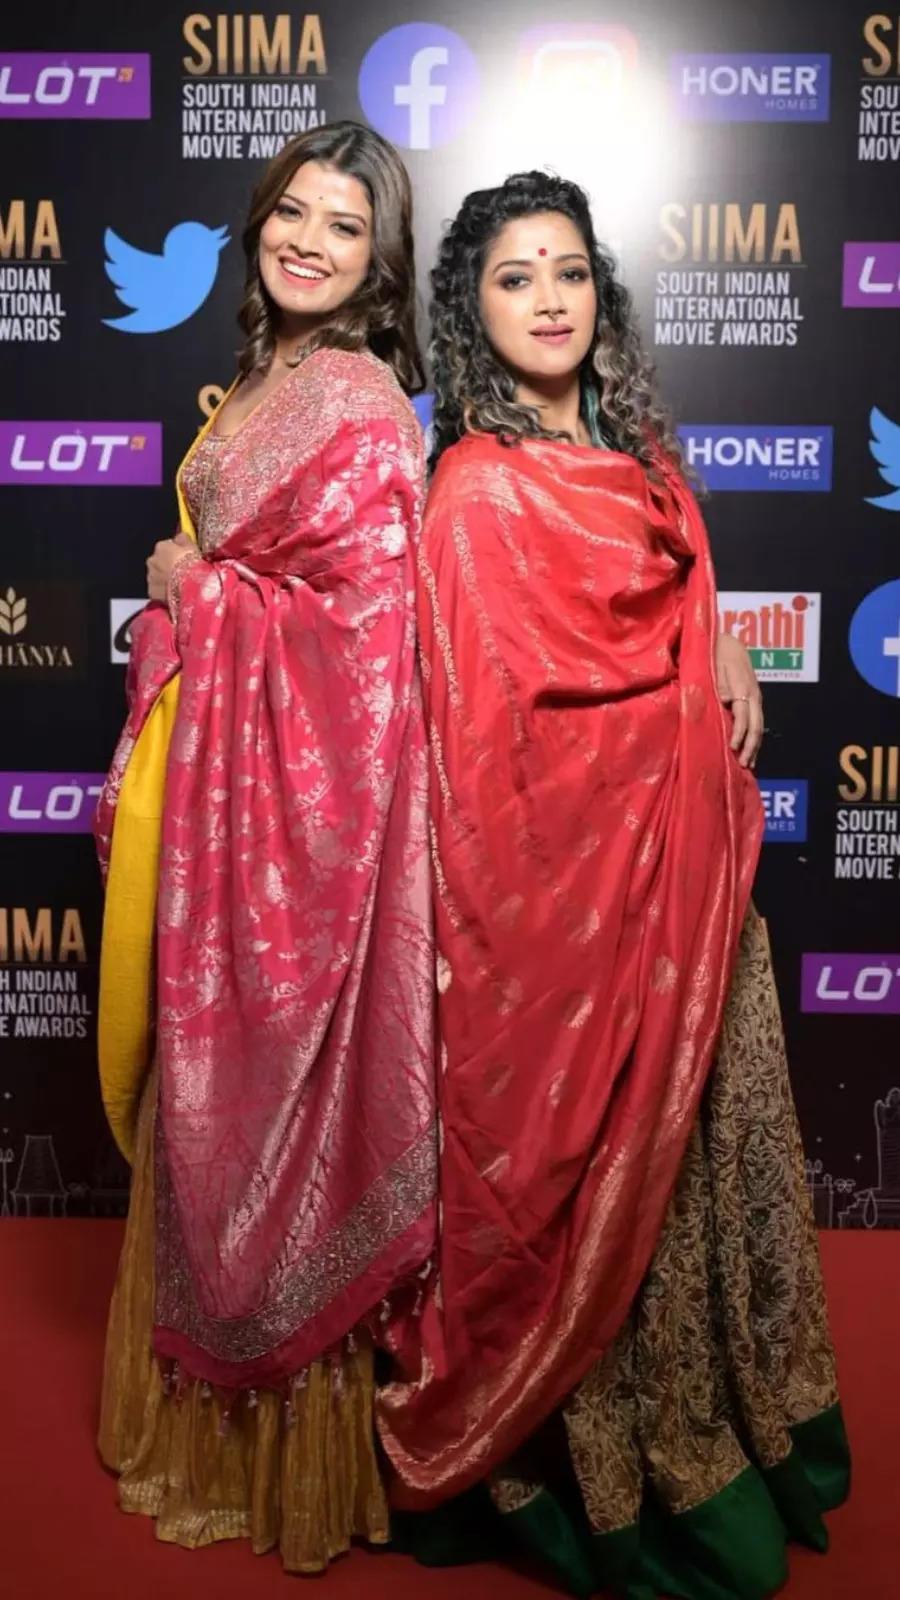 Amrutha Suresh